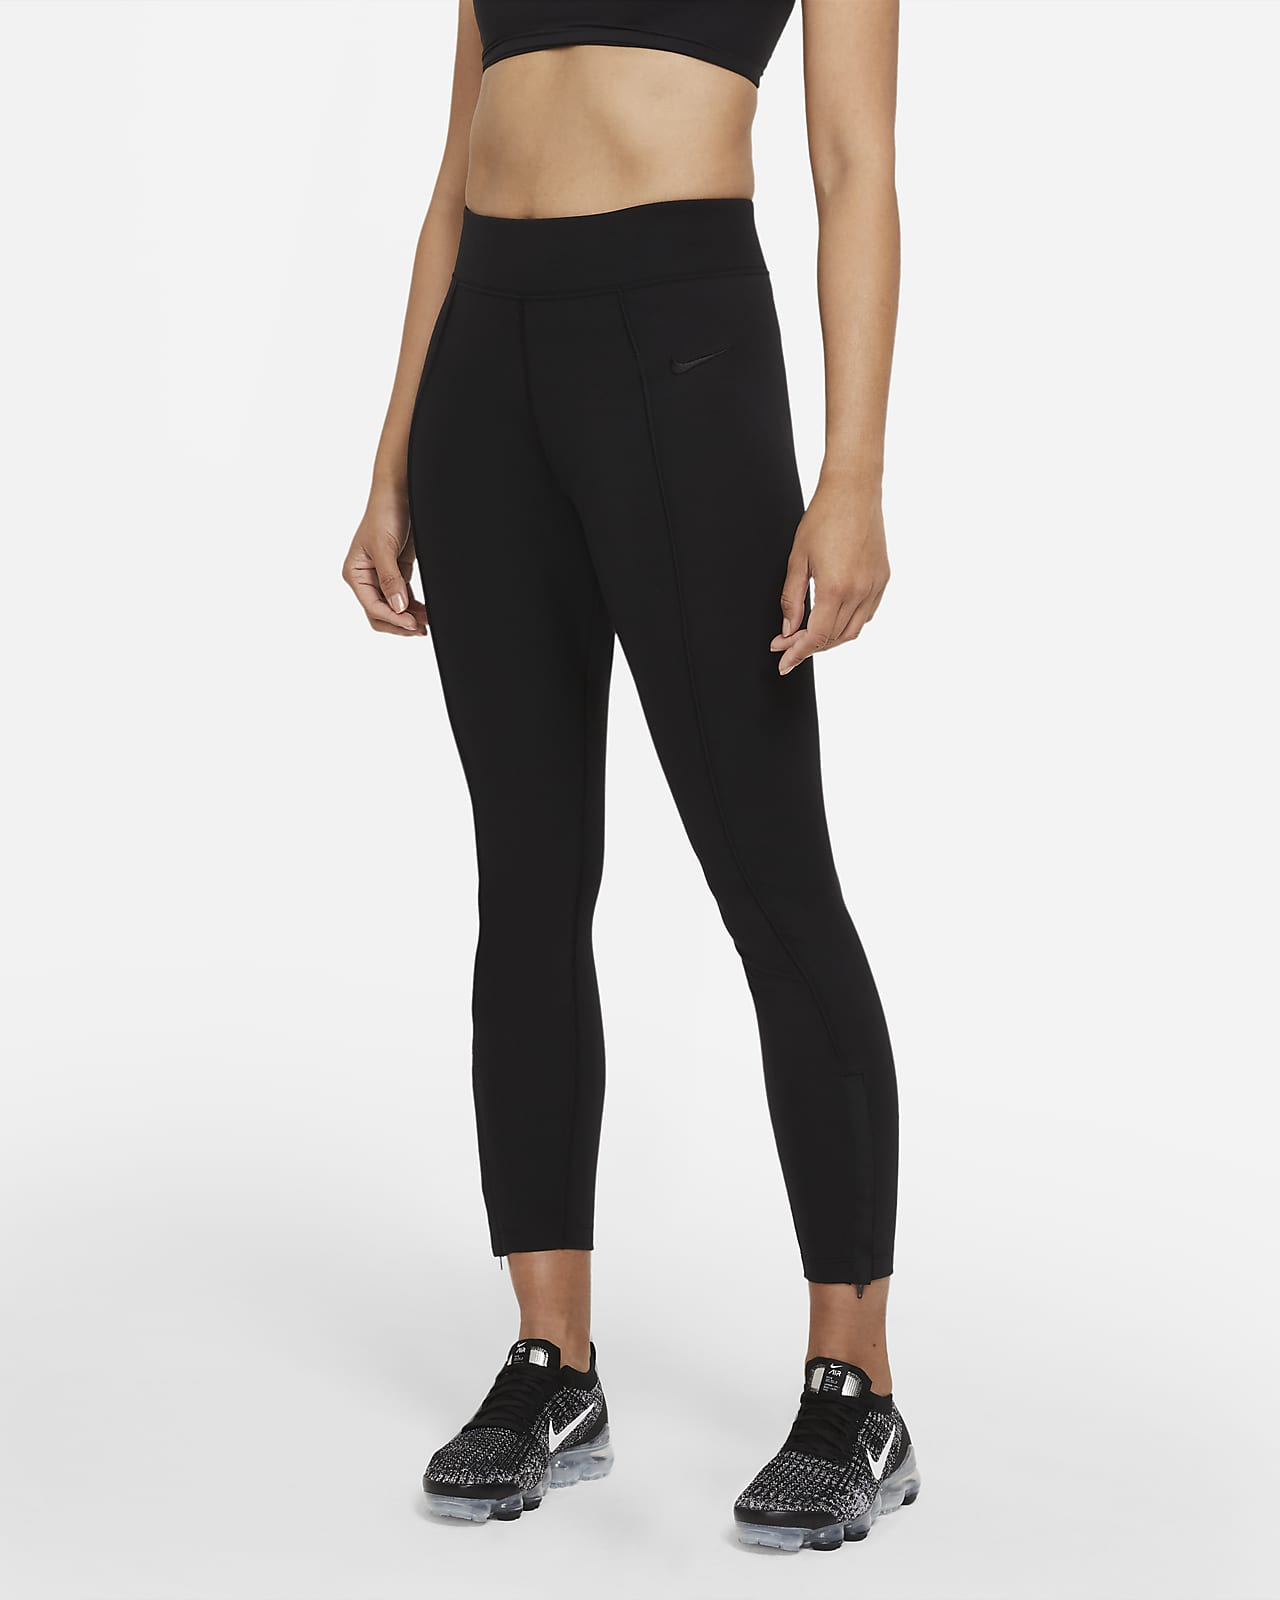 Nike Sportswear Leg-A-See 女款內搭褲